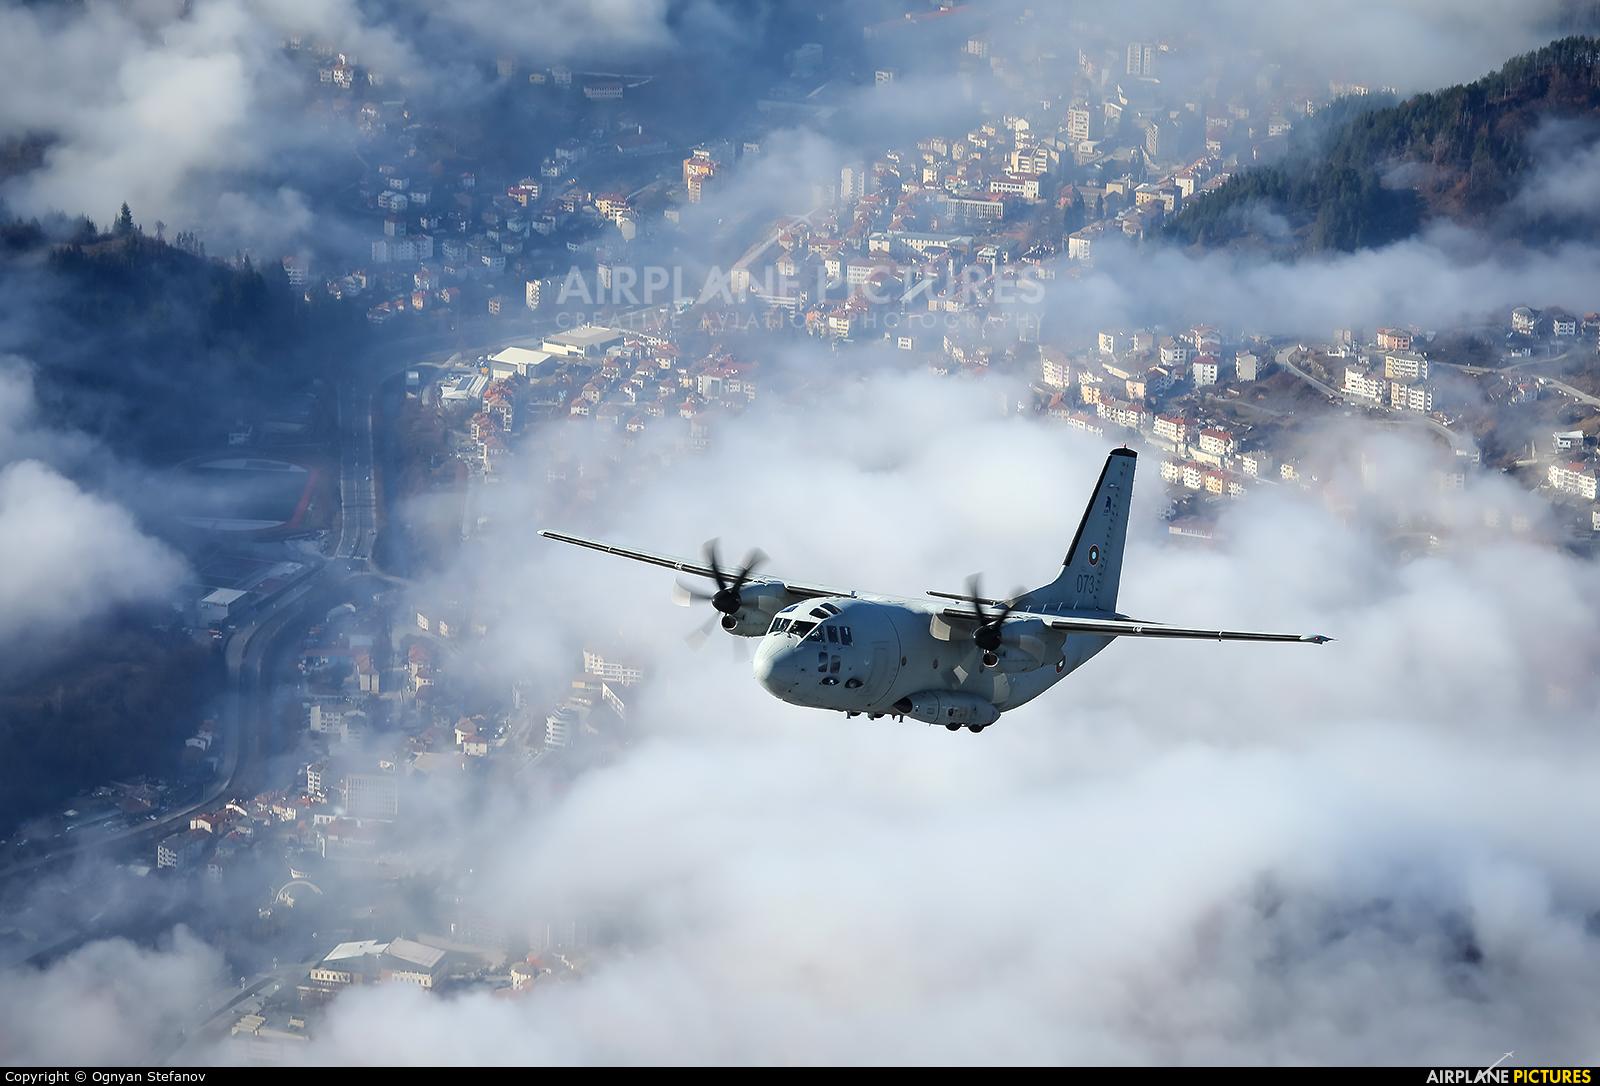 Bulgaria - Air Force 073 aircraft at In Flight - Bulgaria